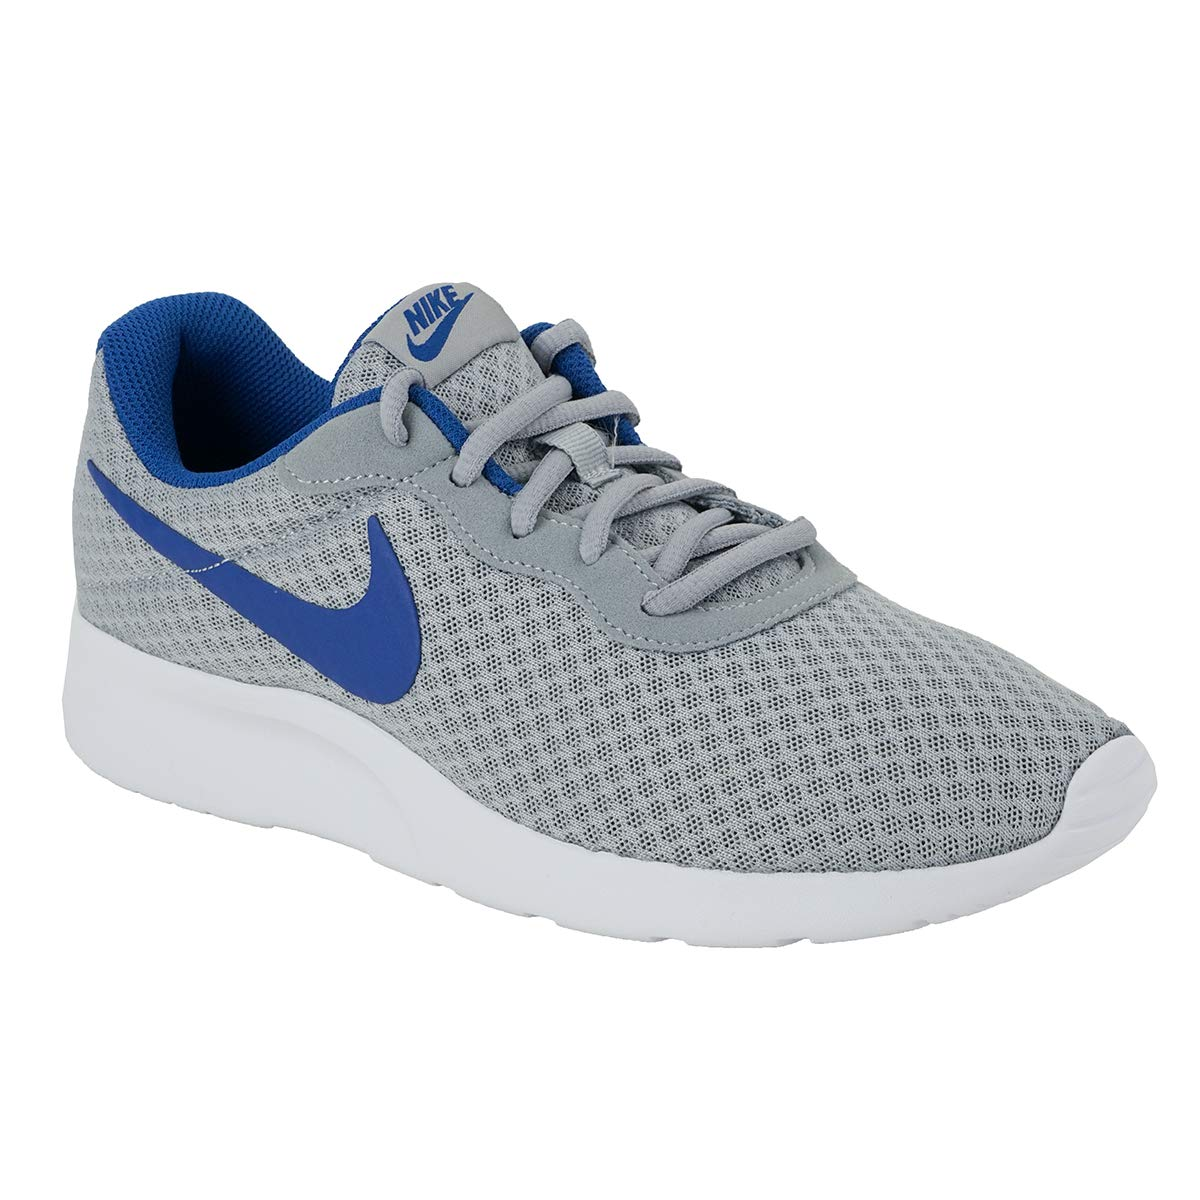 9f8d811003c0d3 Galleon - Nike Men s Tanjun Print Running Shoe (10.5 D(M) US